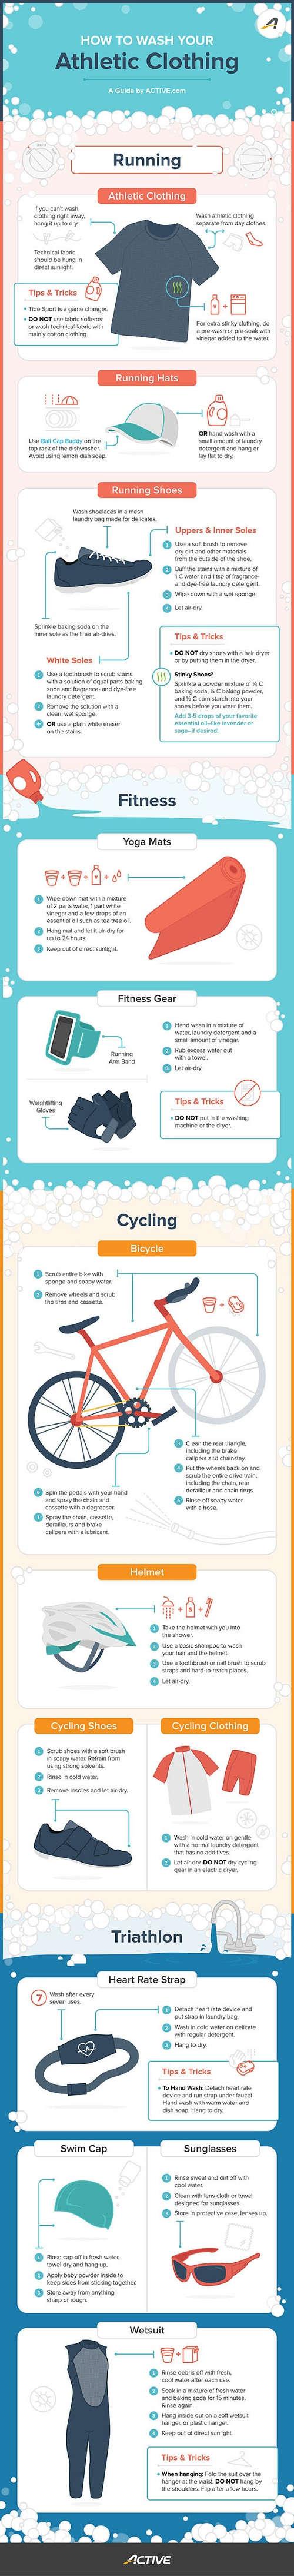 Cómo lavar tu ropa deportiva infografía (1)